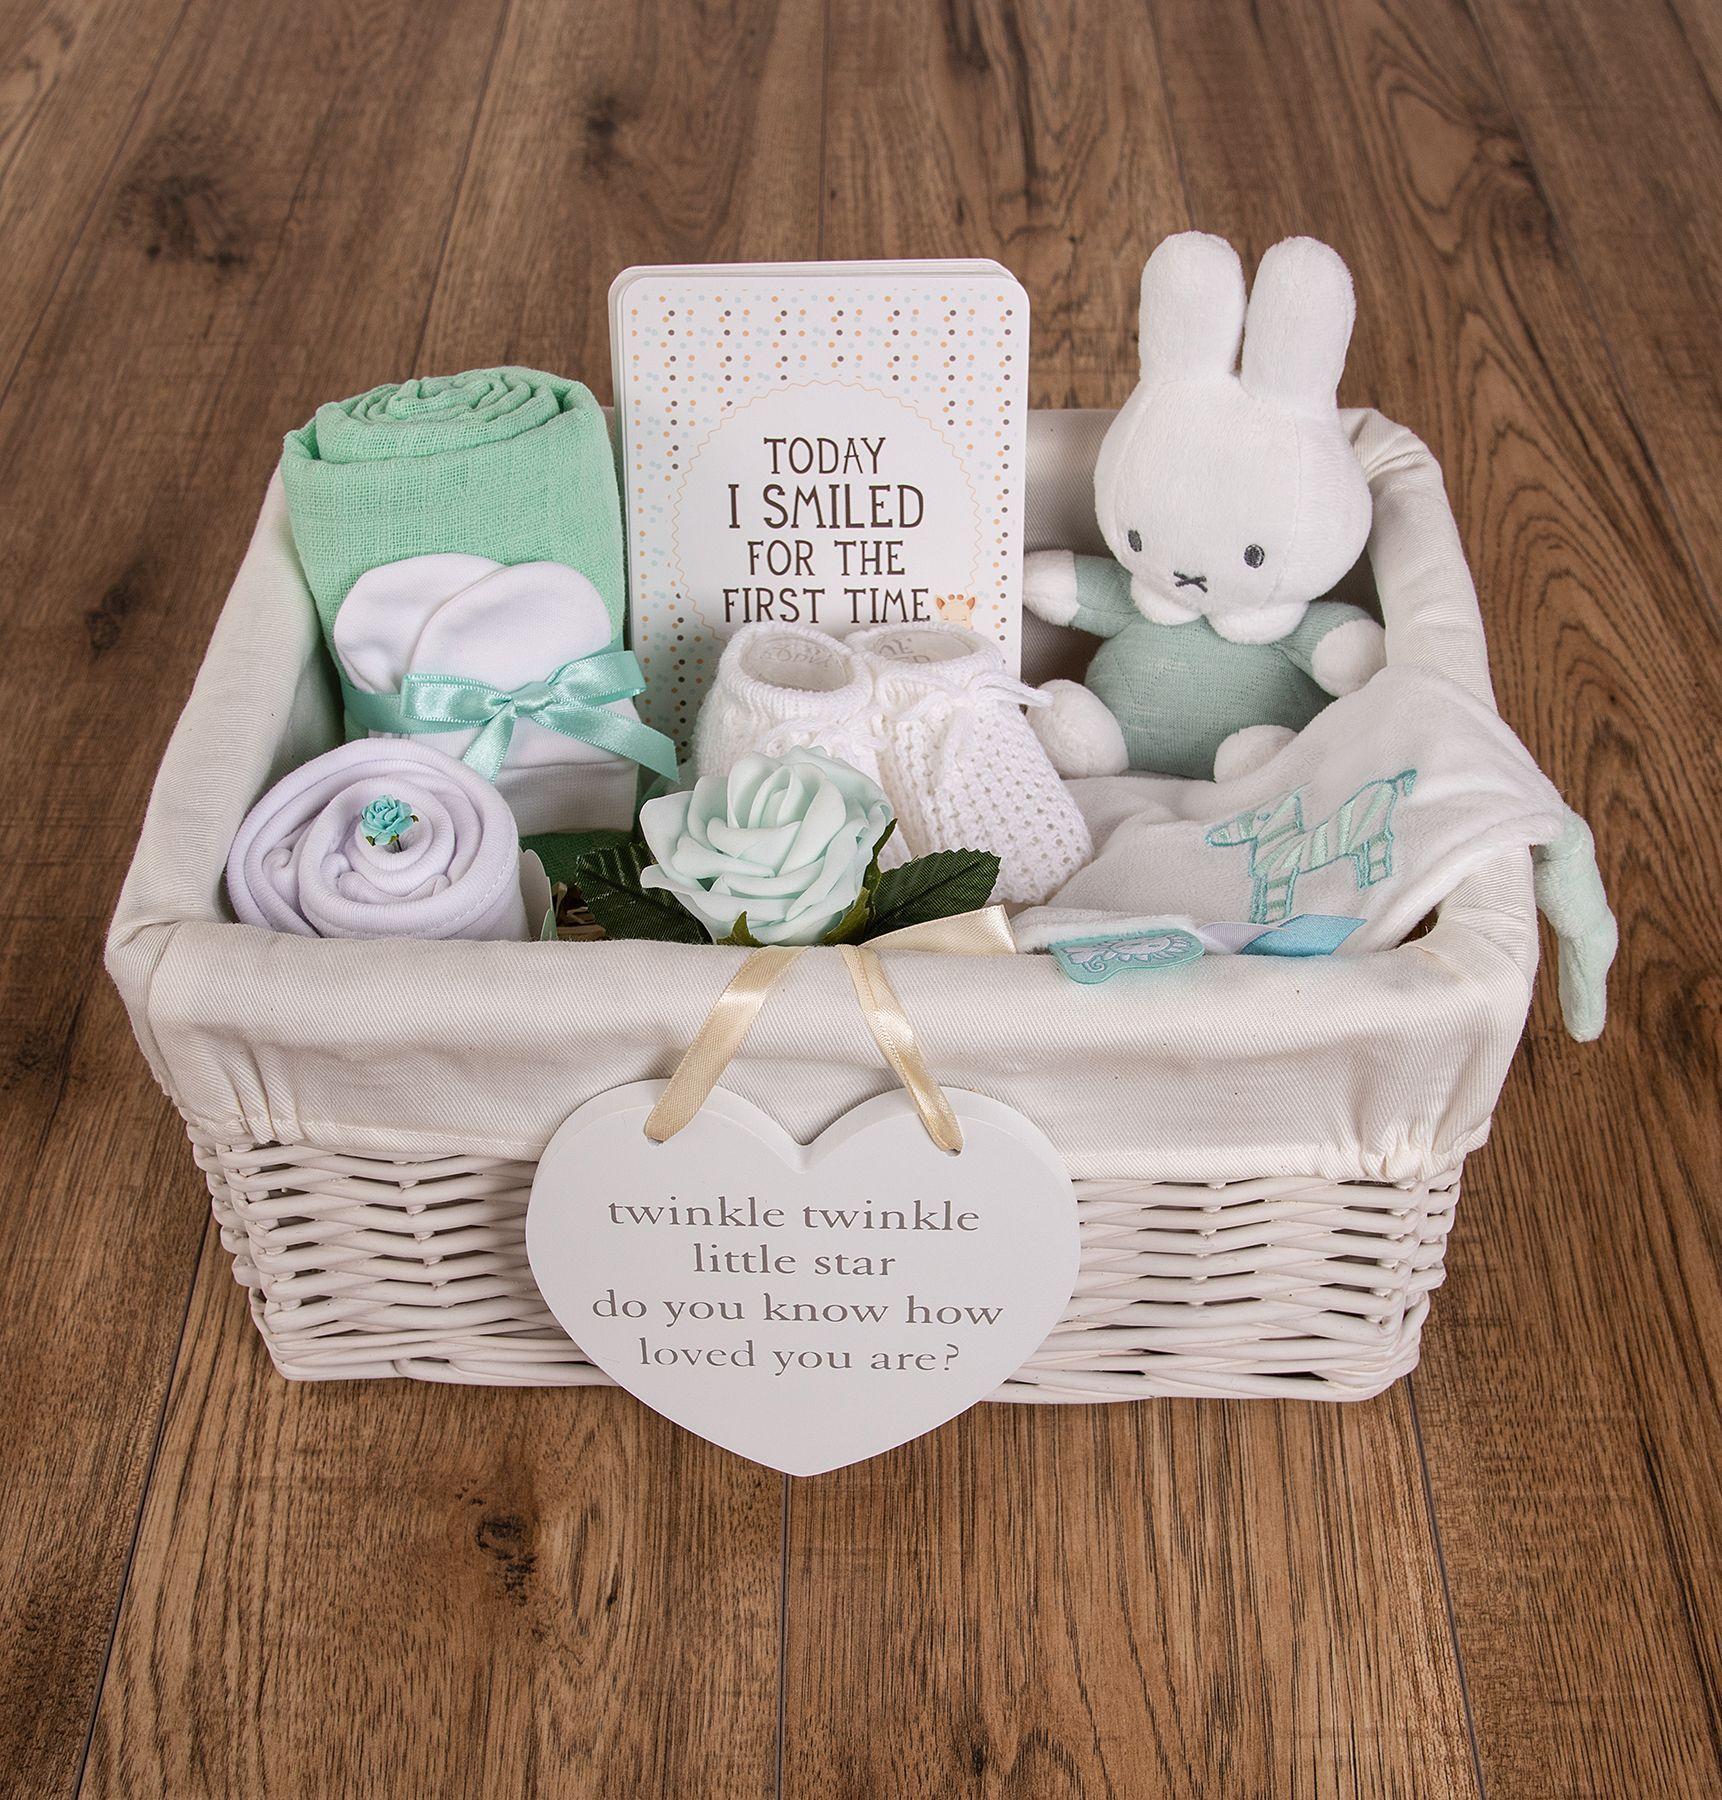 My First Miffy Baby Hamper Baby Hamper Miffy Baby Hamper Miffy In 2020 Baby Shower Gift Basket Baby Shower Baskets Baby Hamper